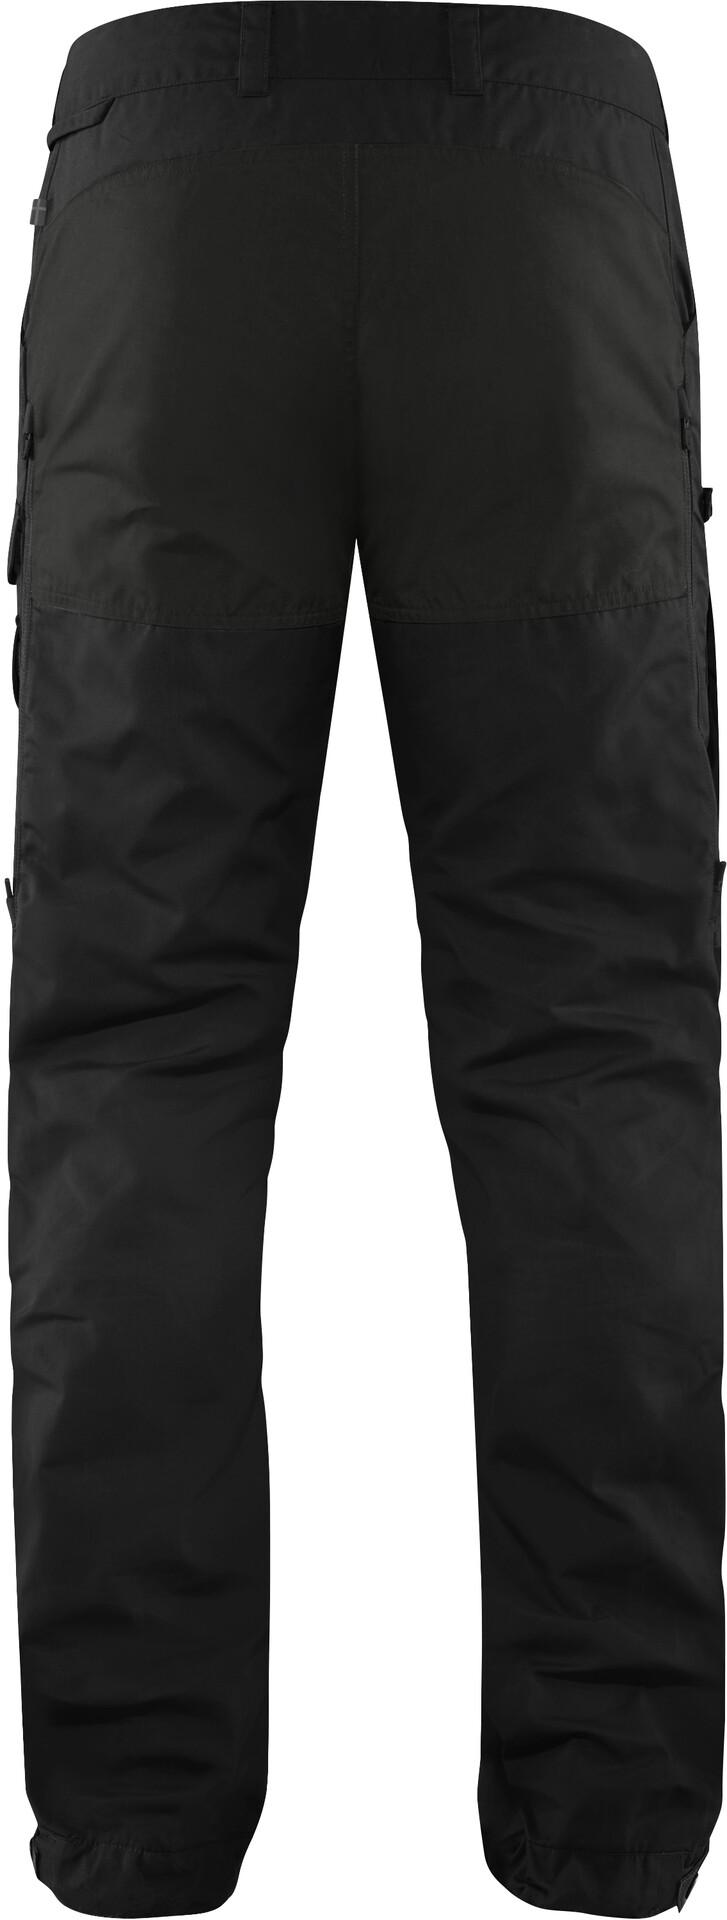 Fjällräven Abisko Trouser Pantaloni da trekking da uomo G 1000 con inserto elastico